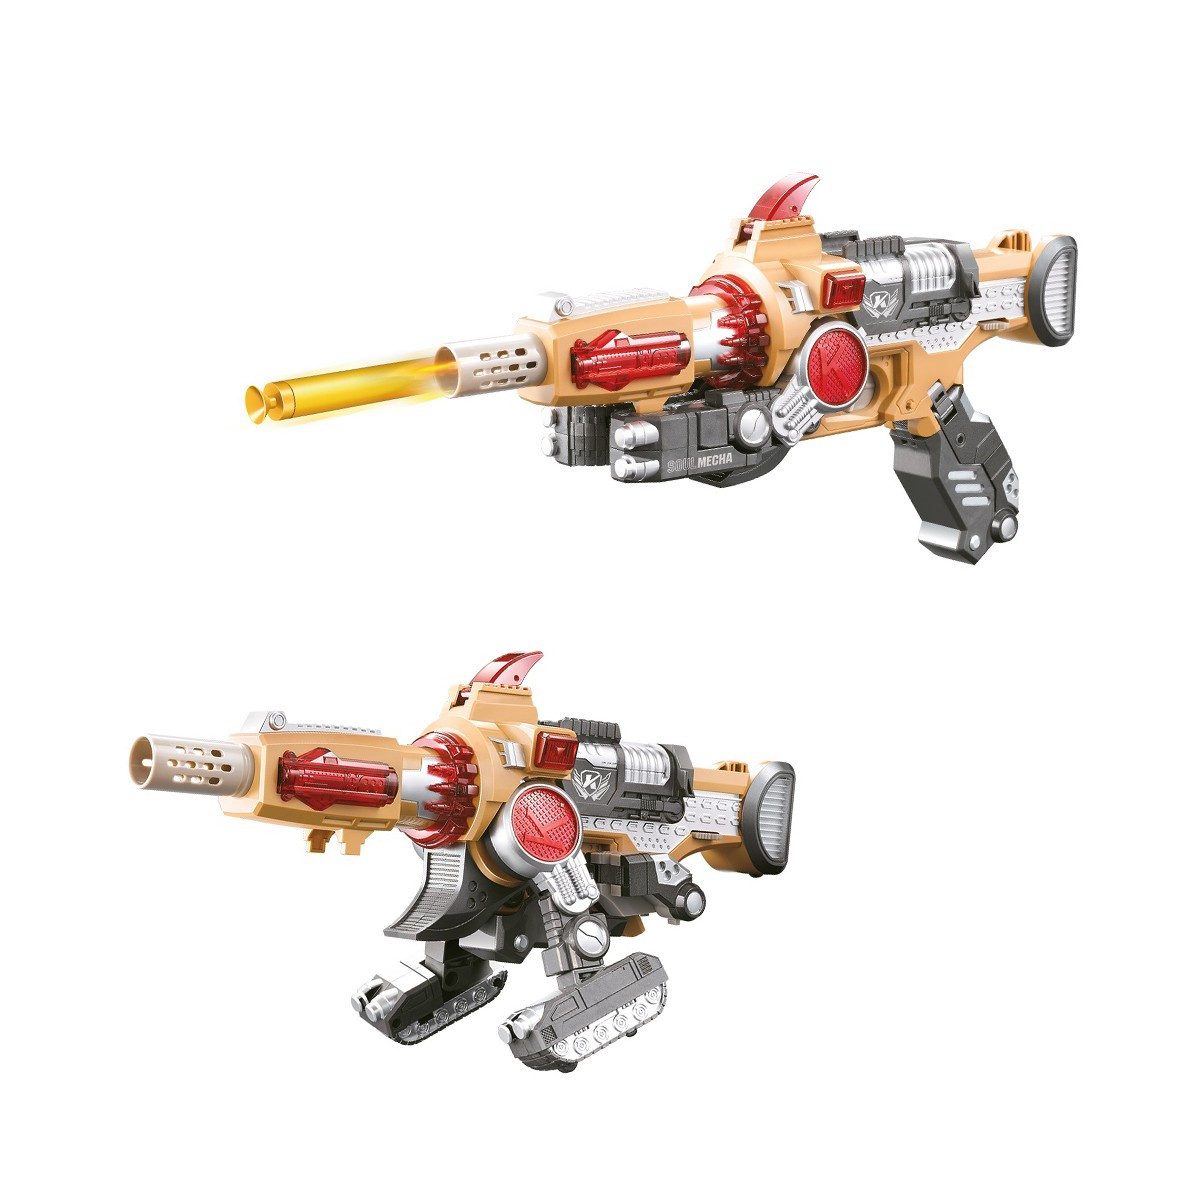 Трансформер - баттлбот Dinobots Пушка 30 см (SB463)